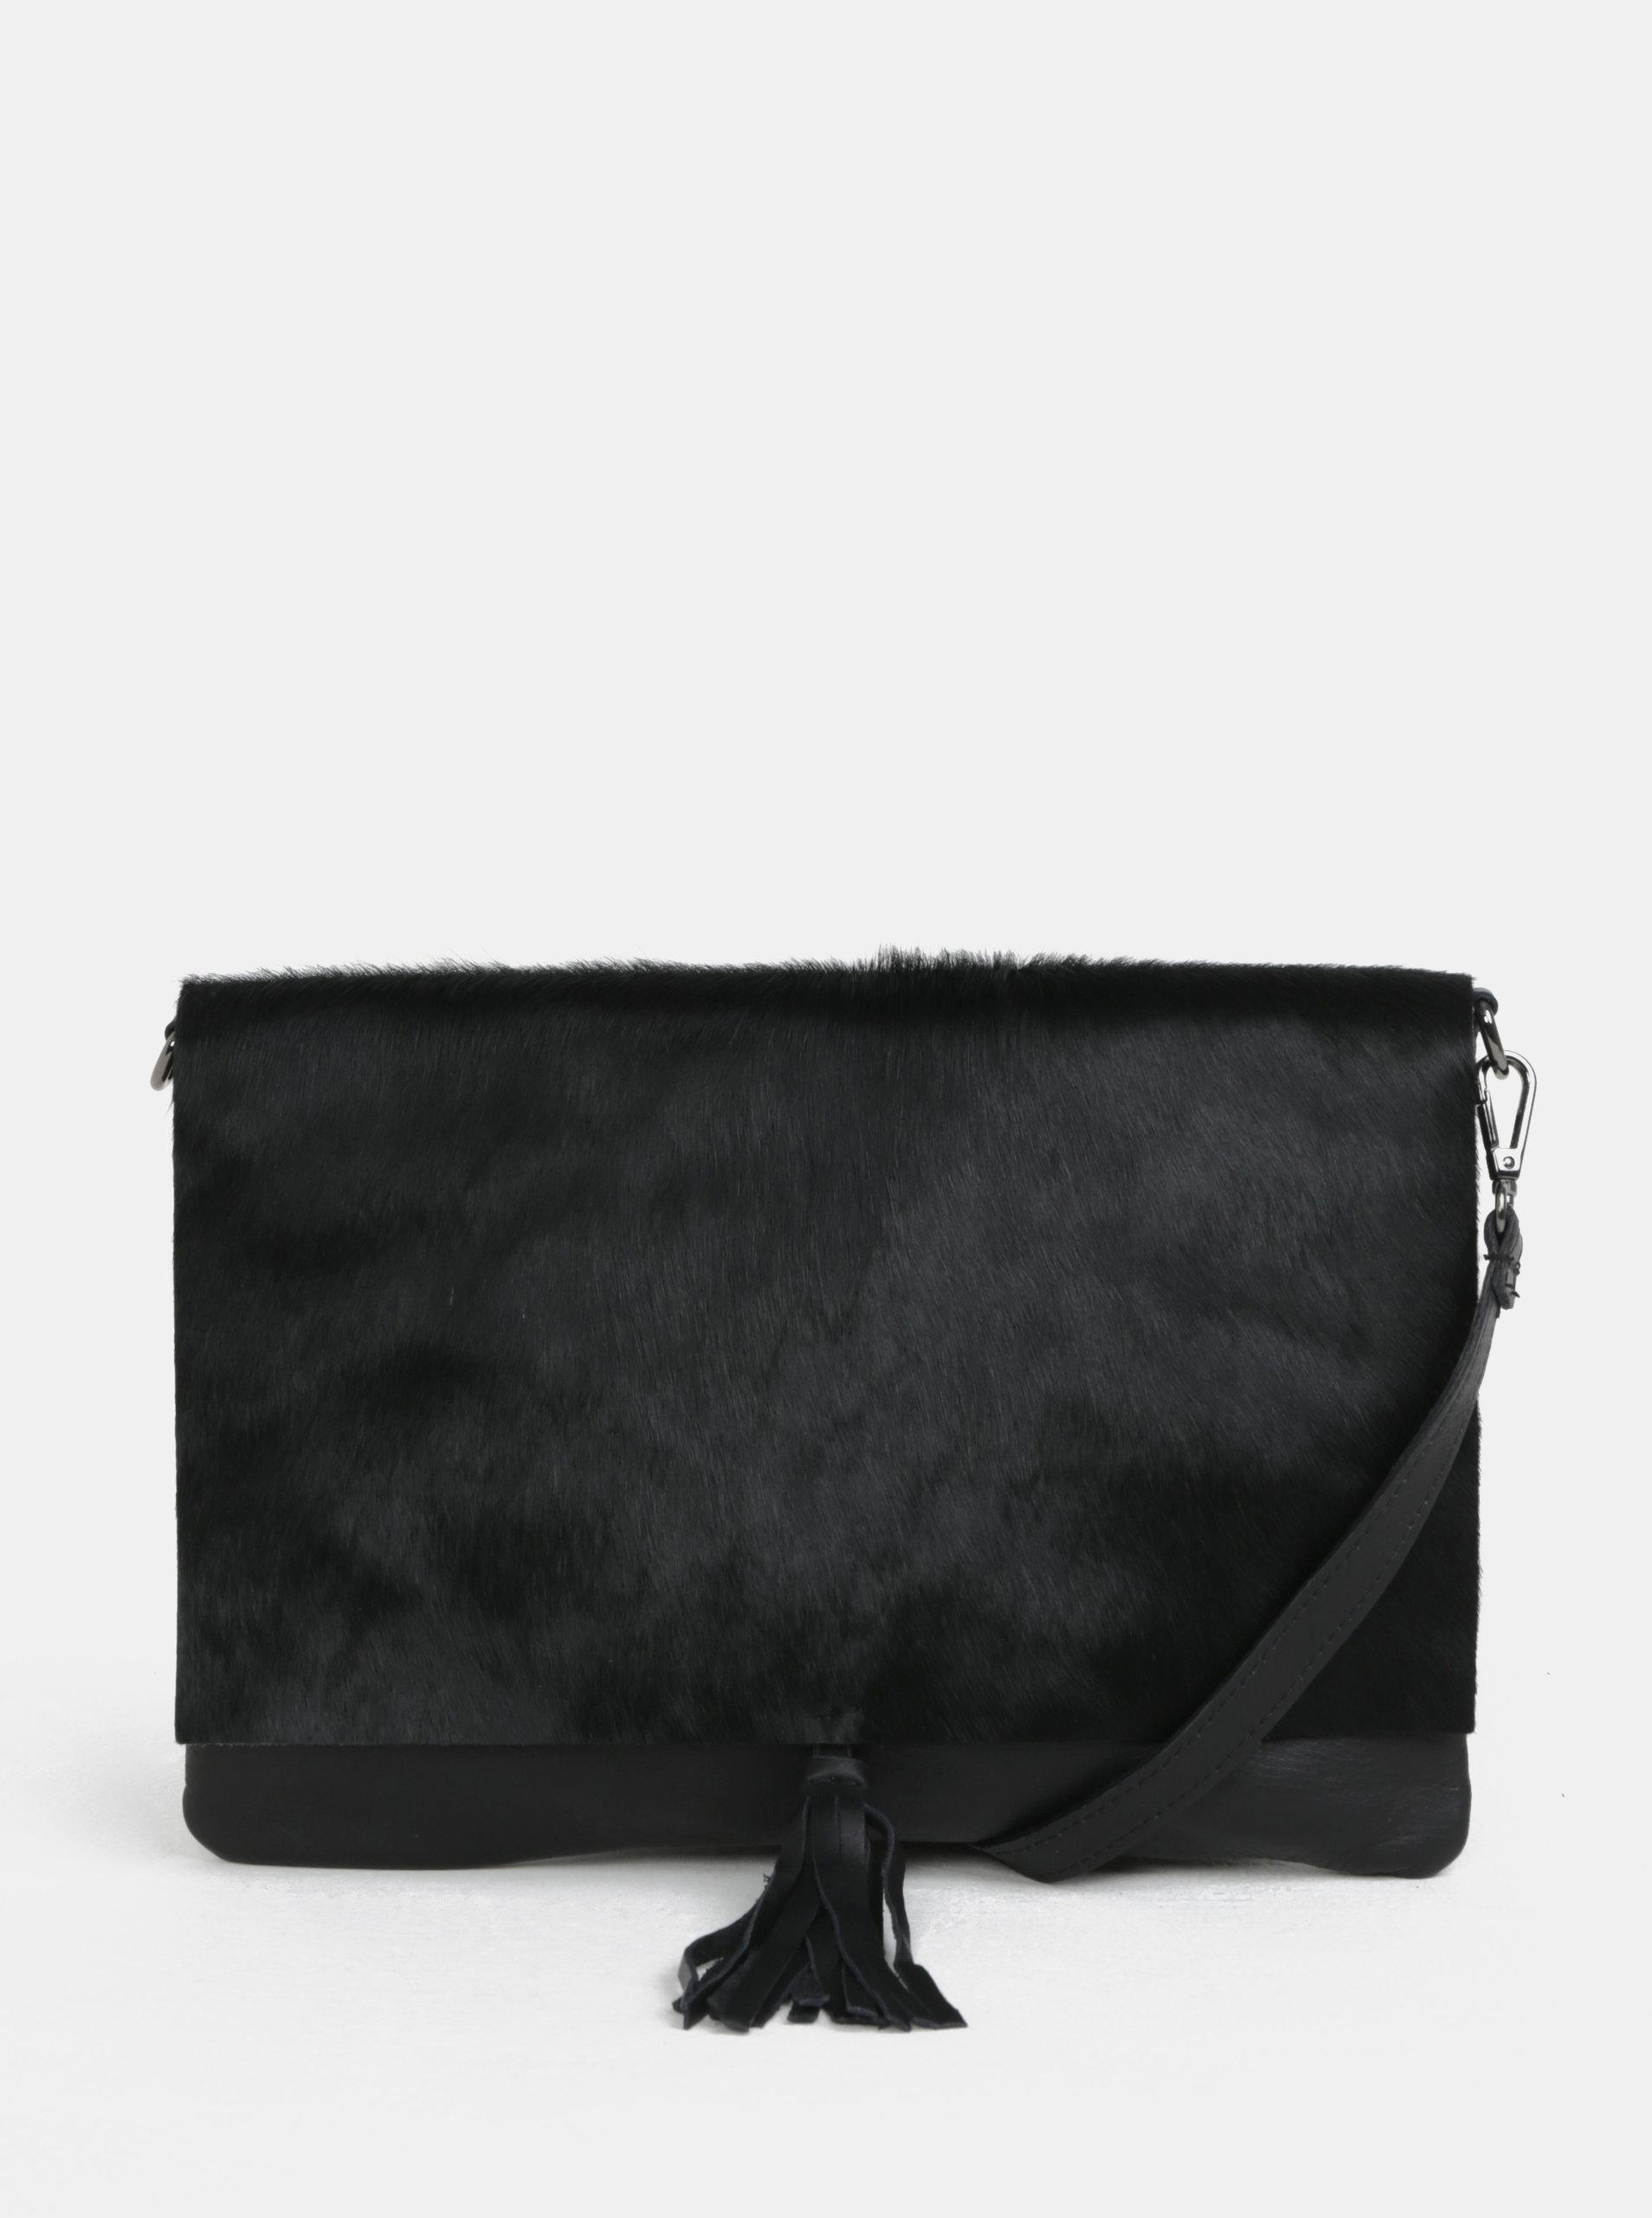 Čierna kožená crossbody kabelka s kožušinovou chlopňou ZOOT ... 723b0640d55